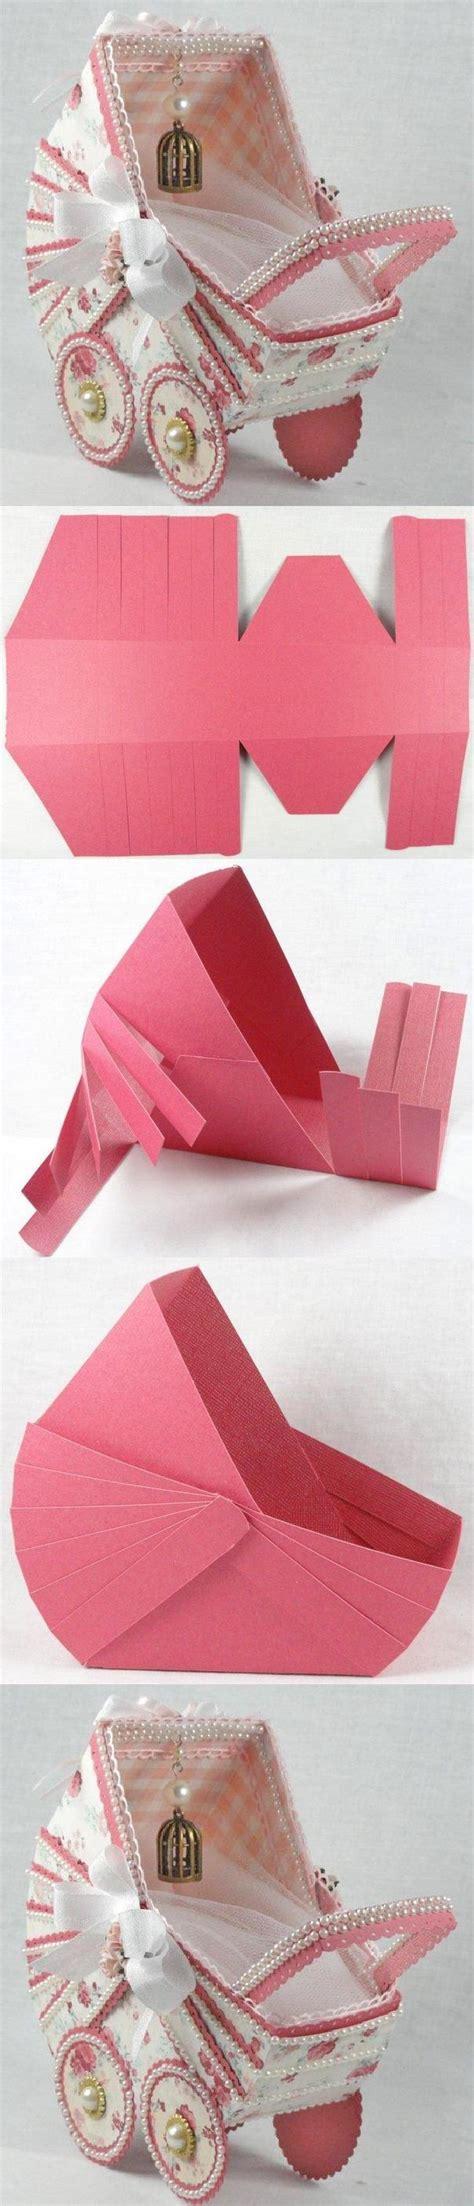 paper craft tutorials diy paper stroller diy projects usefuldiy